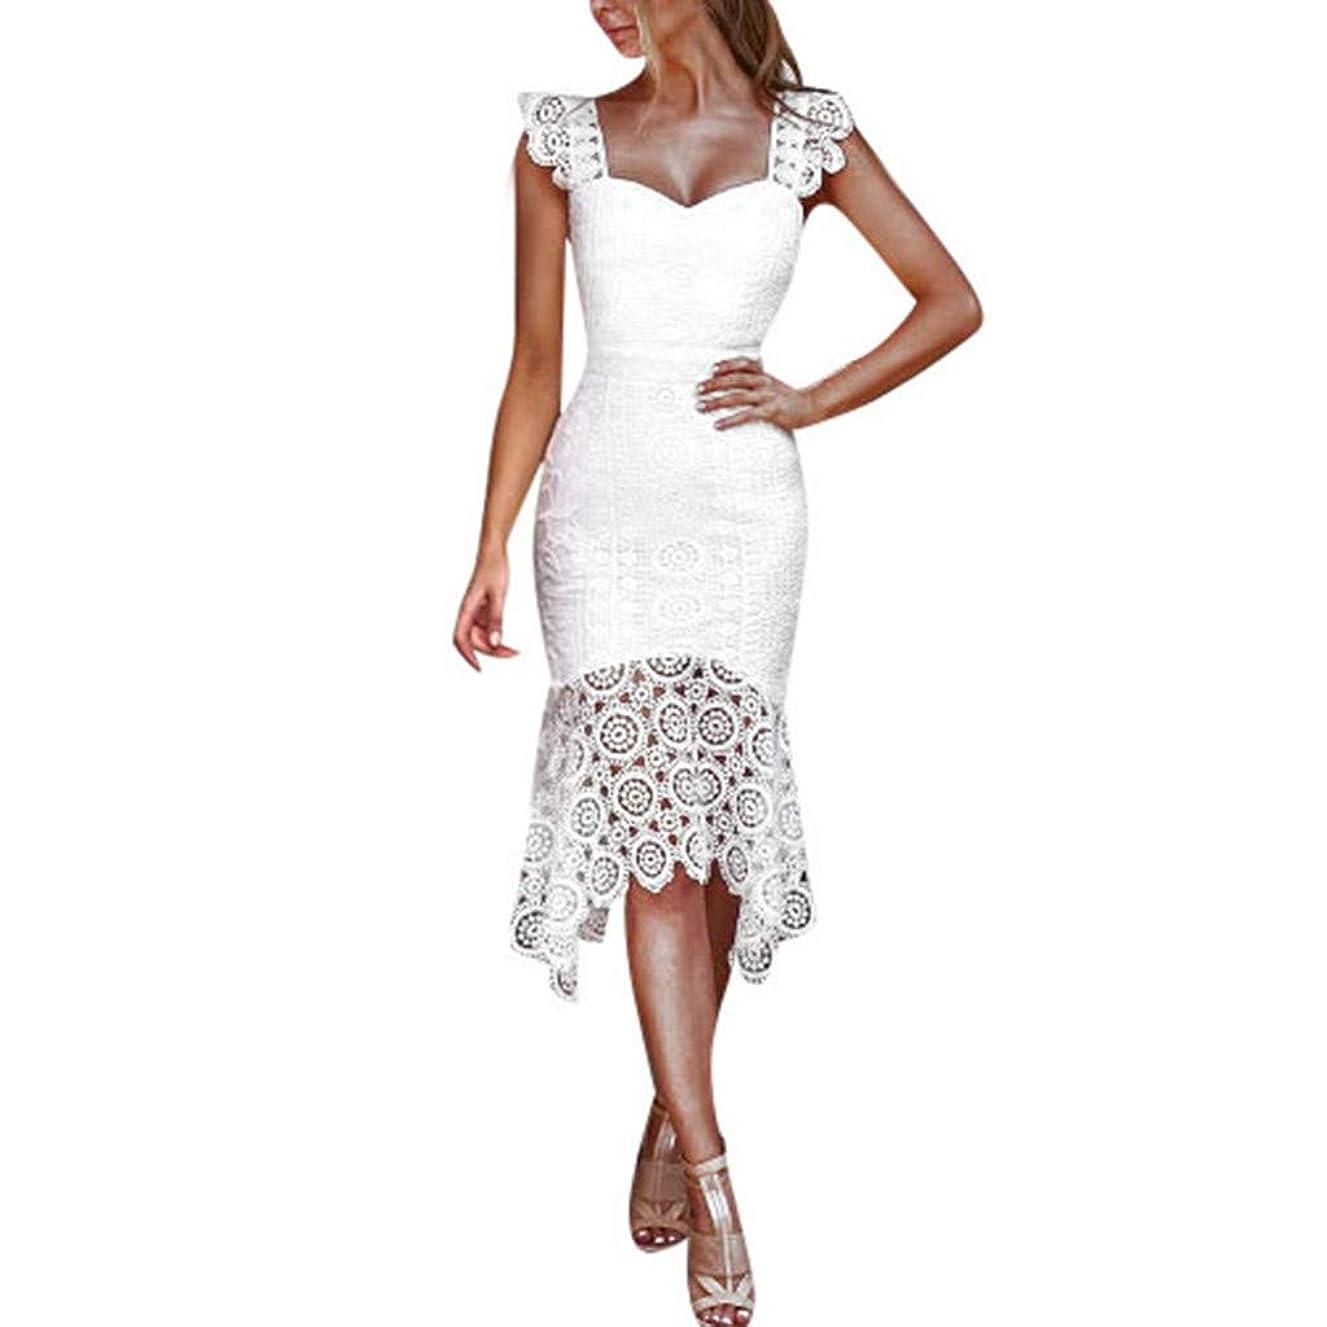 Summer Boho Dresses for Women Lace Casual Beach Sundress Evening Party Dress White Dress Chaofanjiancai